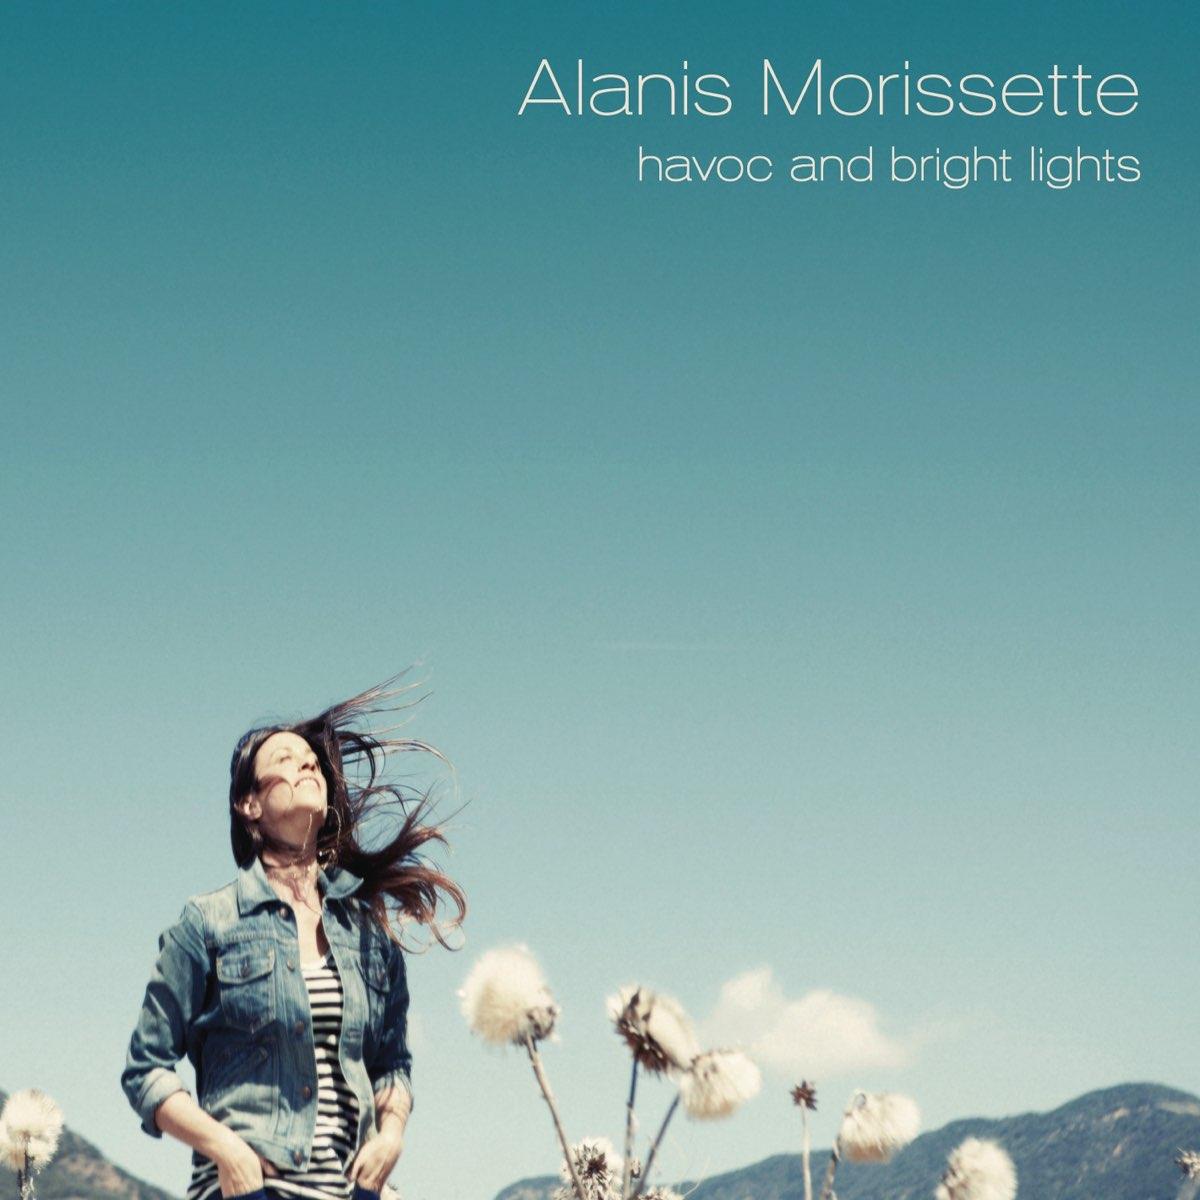 Alanis Morissette, Havoc and Bright Lights